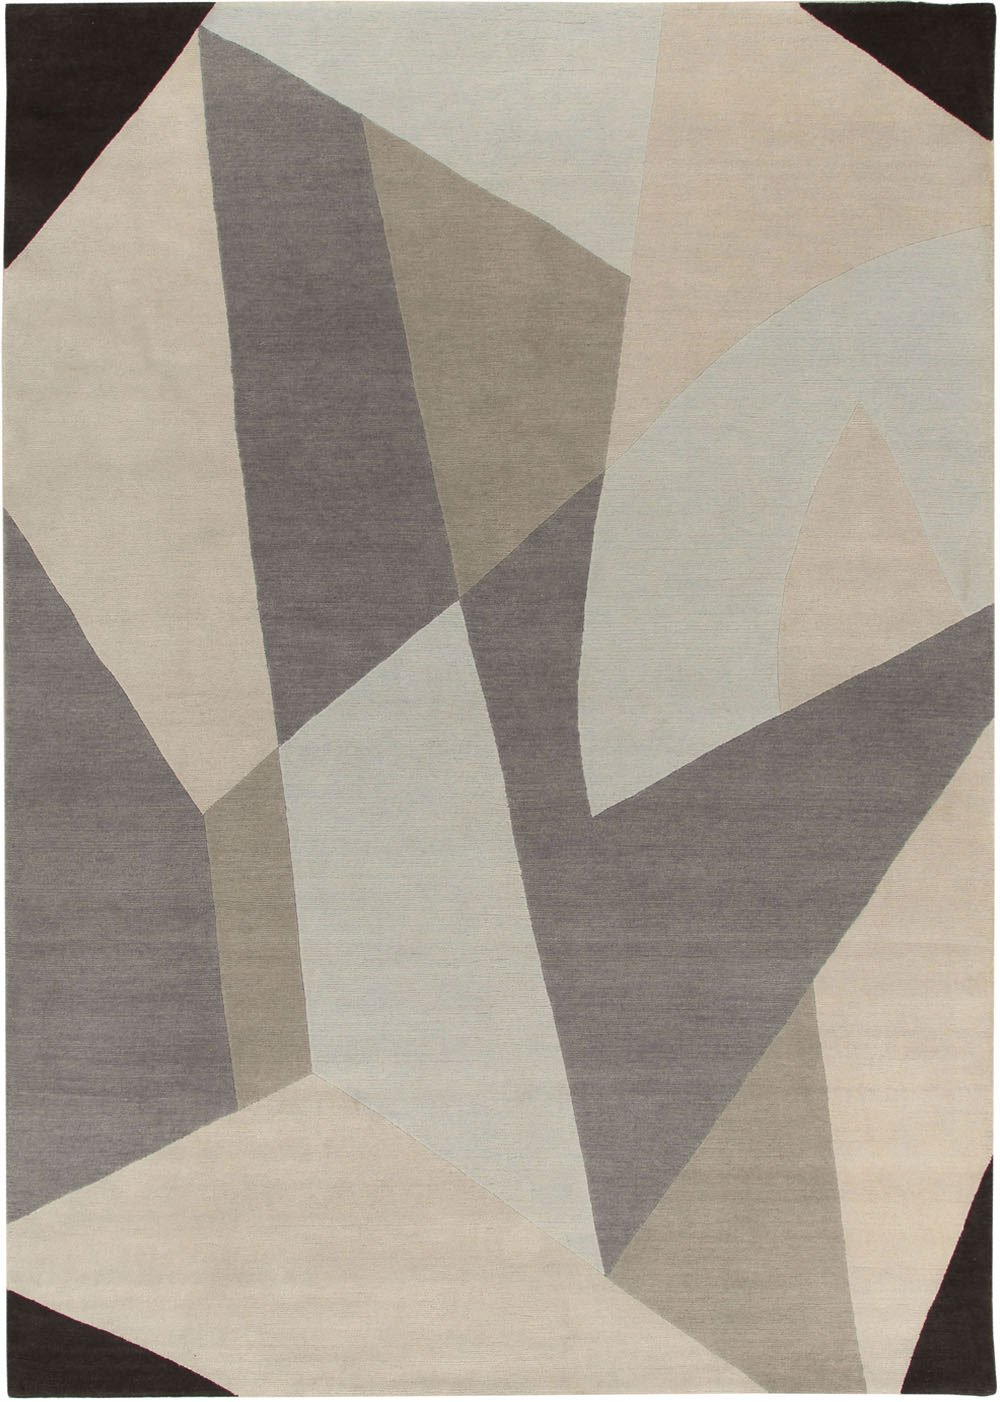 La Datina riflessi carpet Gio Ponti